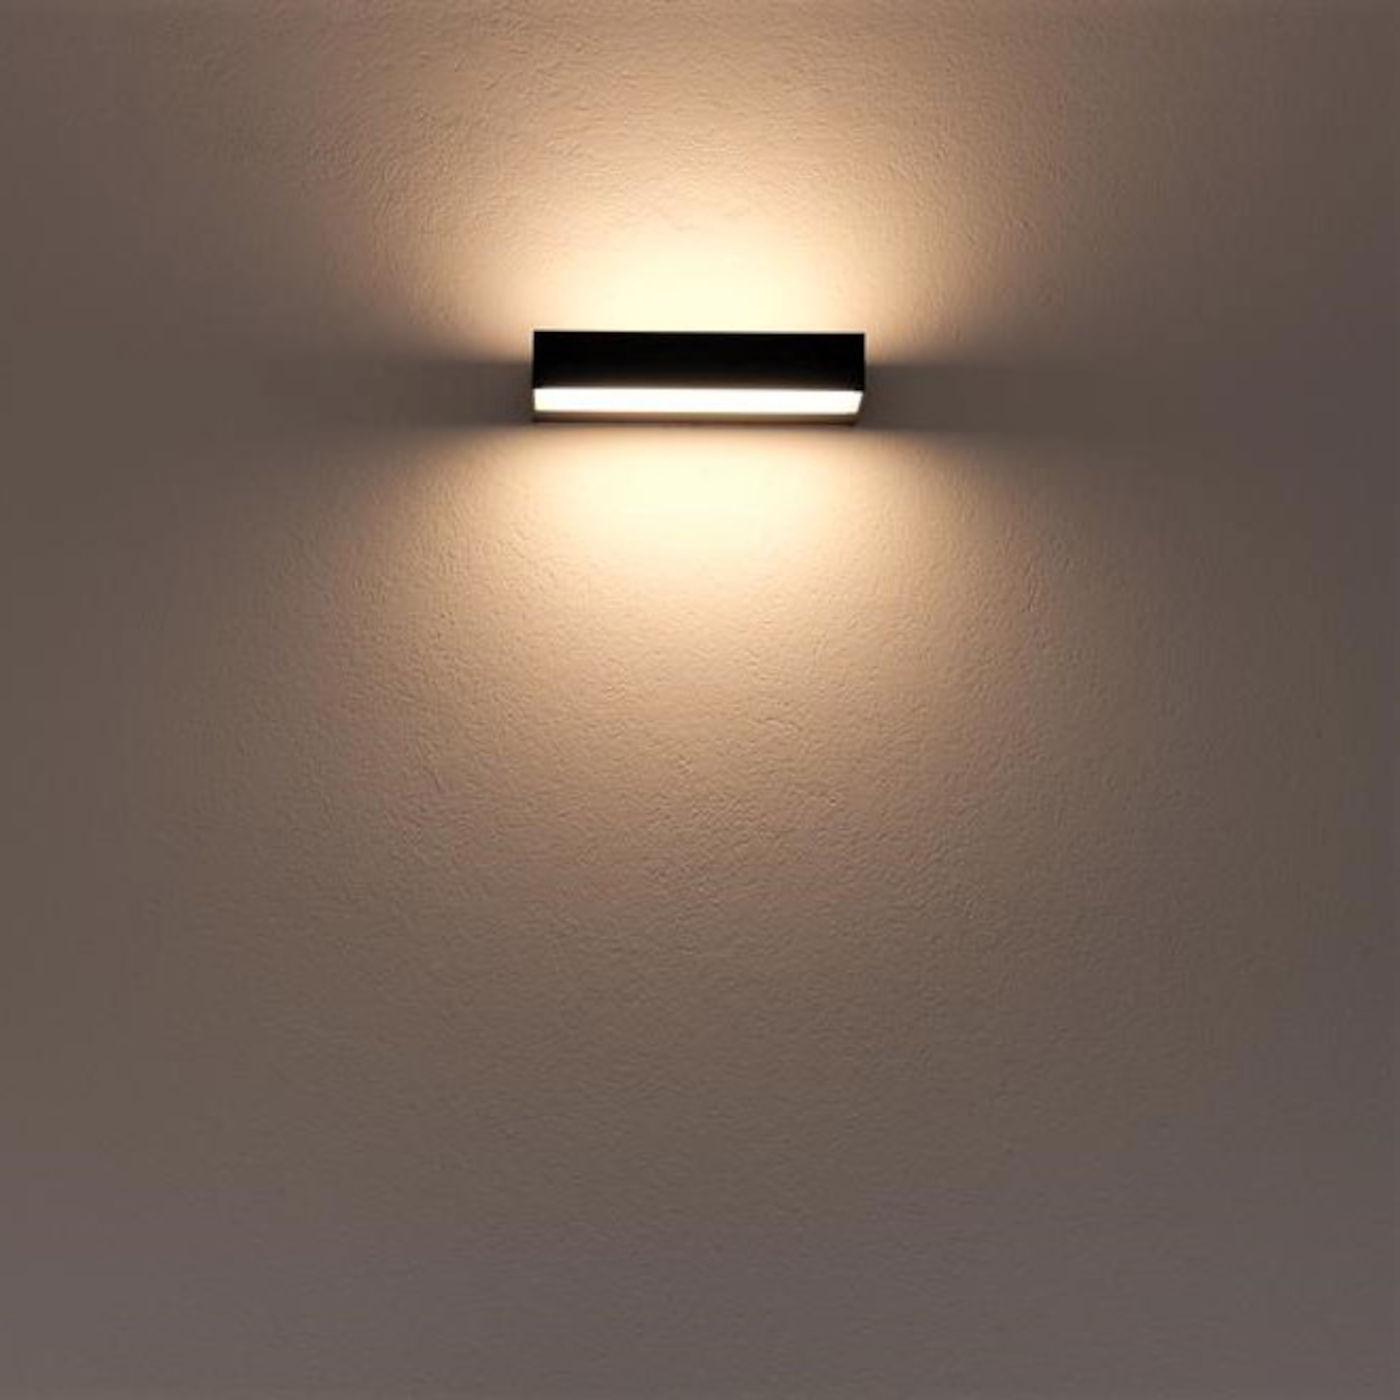 Bega 24473 LED Wandleuchte, eckig, zweiseitig abstrahlend